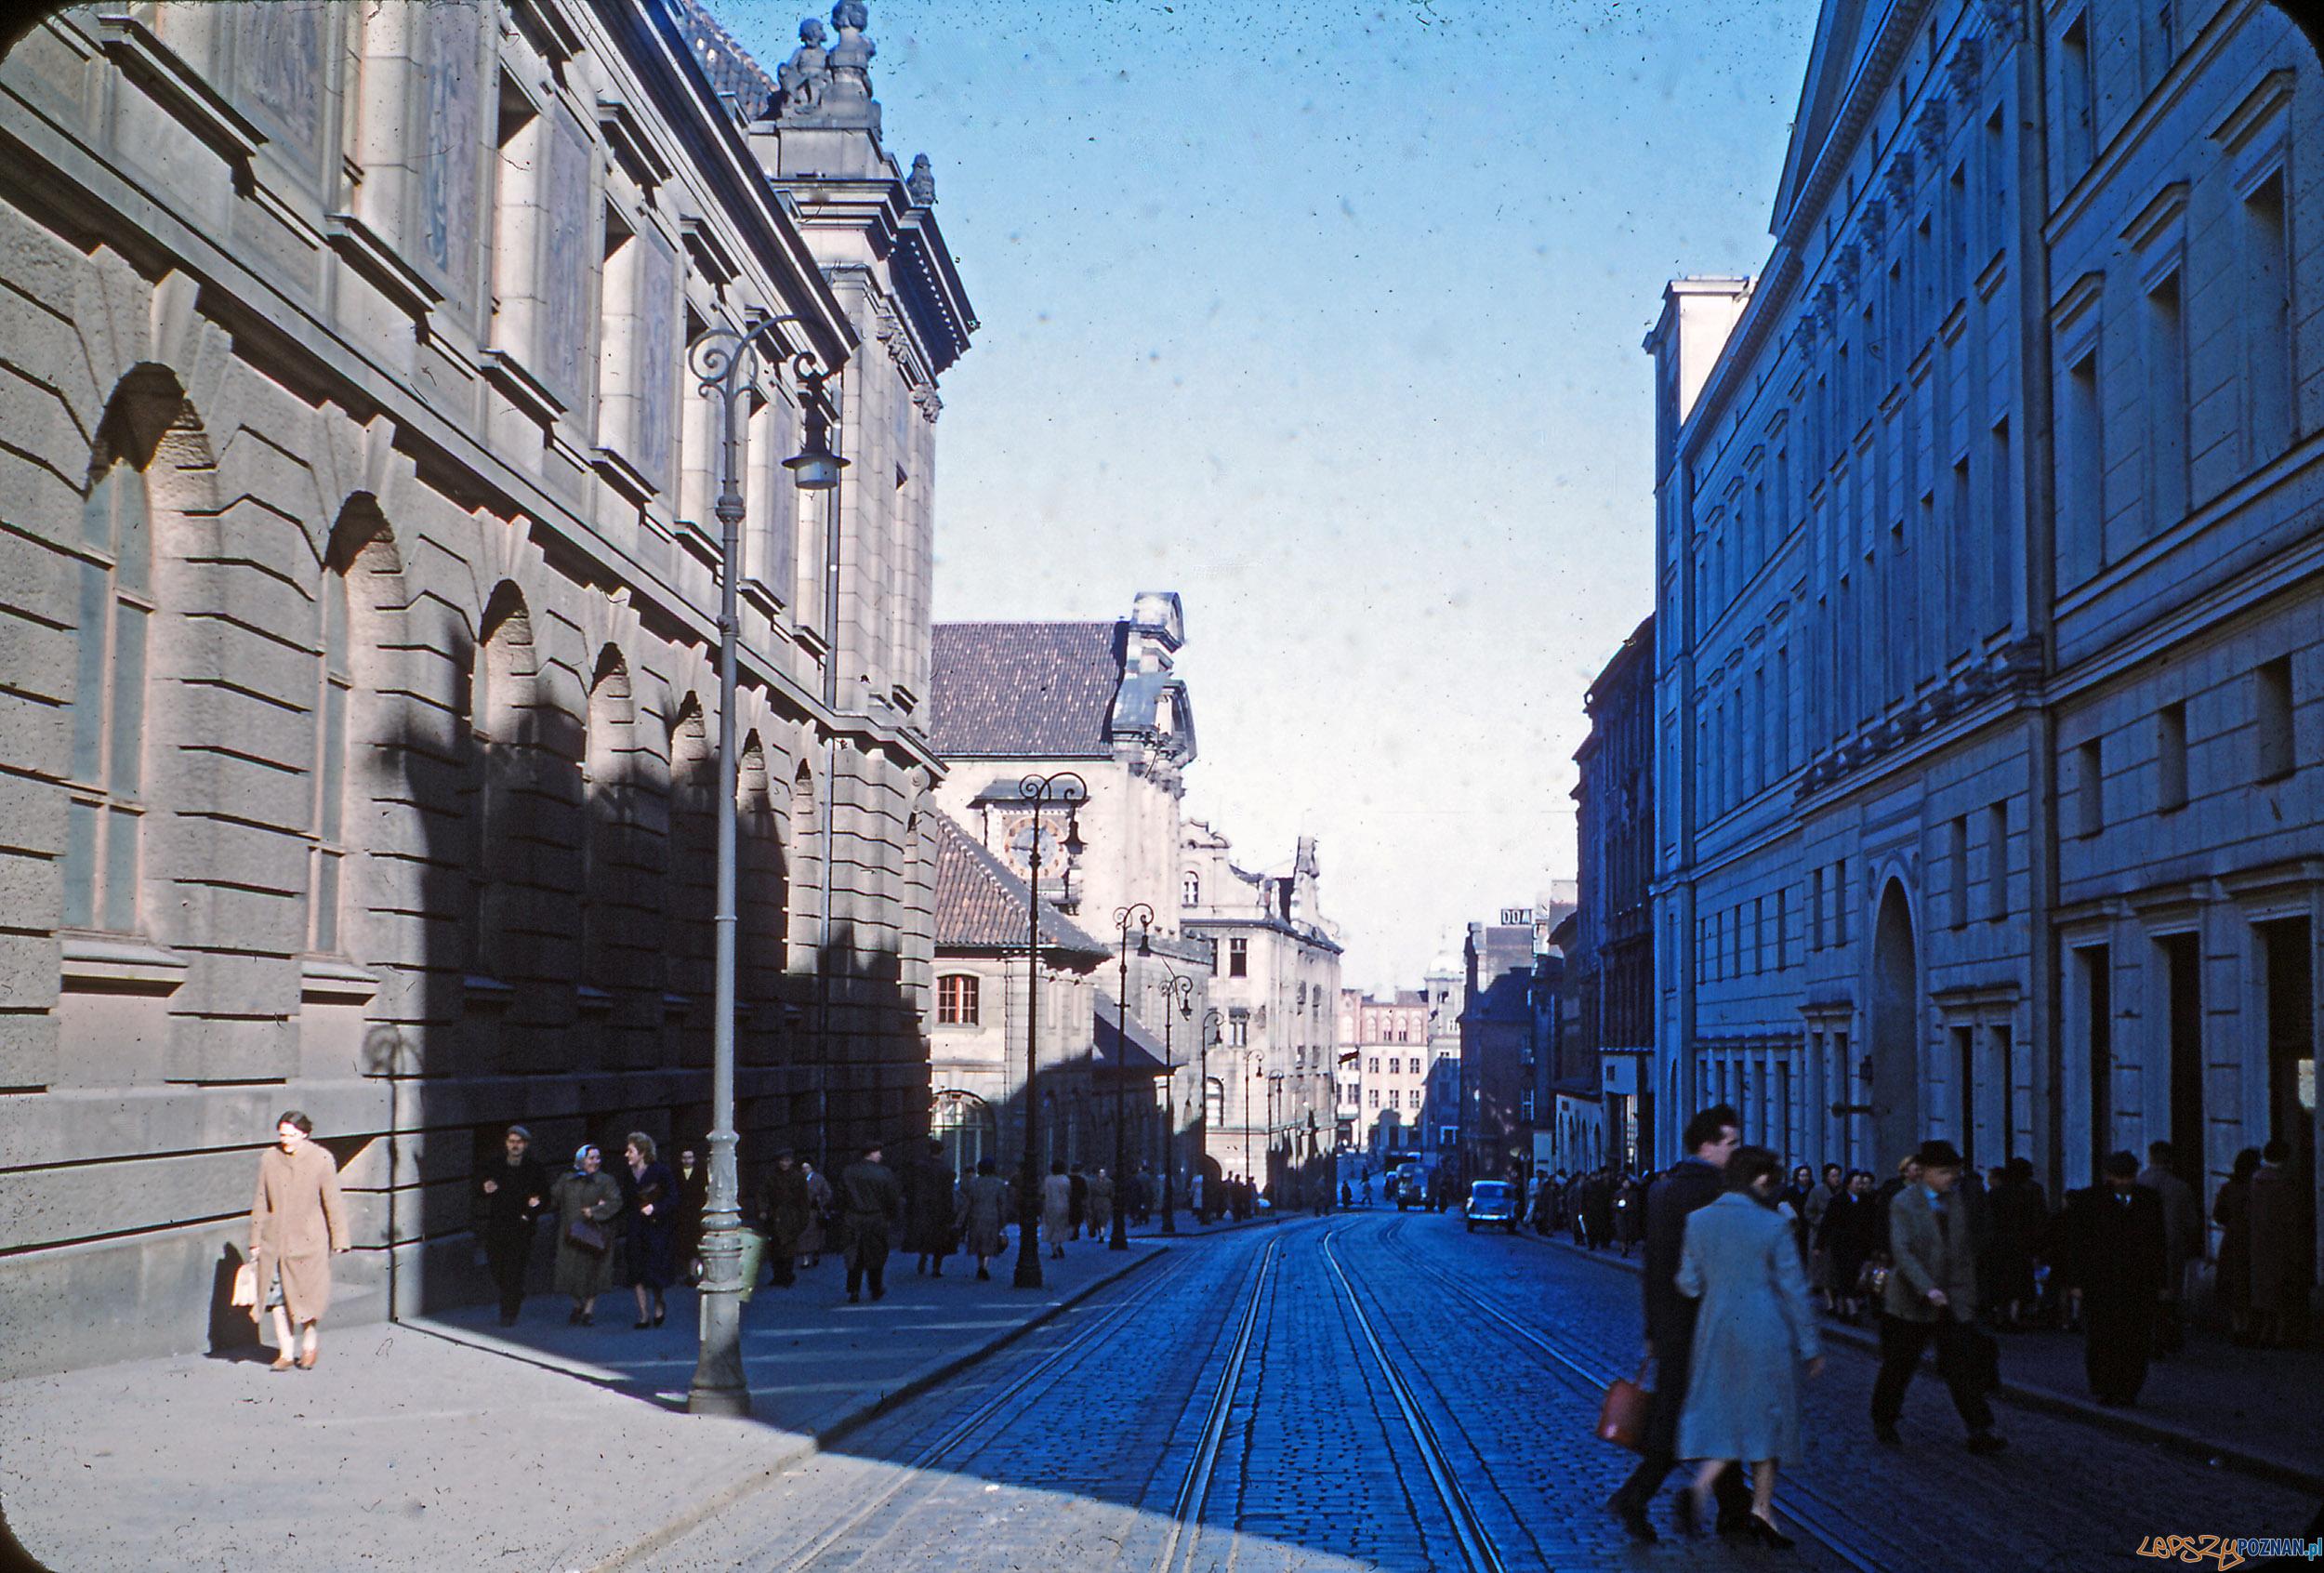 Paderewskiego - koniec lat 50-tych  Foto: Mogens Tørsleff, kolekcja Gorma Rudschinata / Flickr / CC